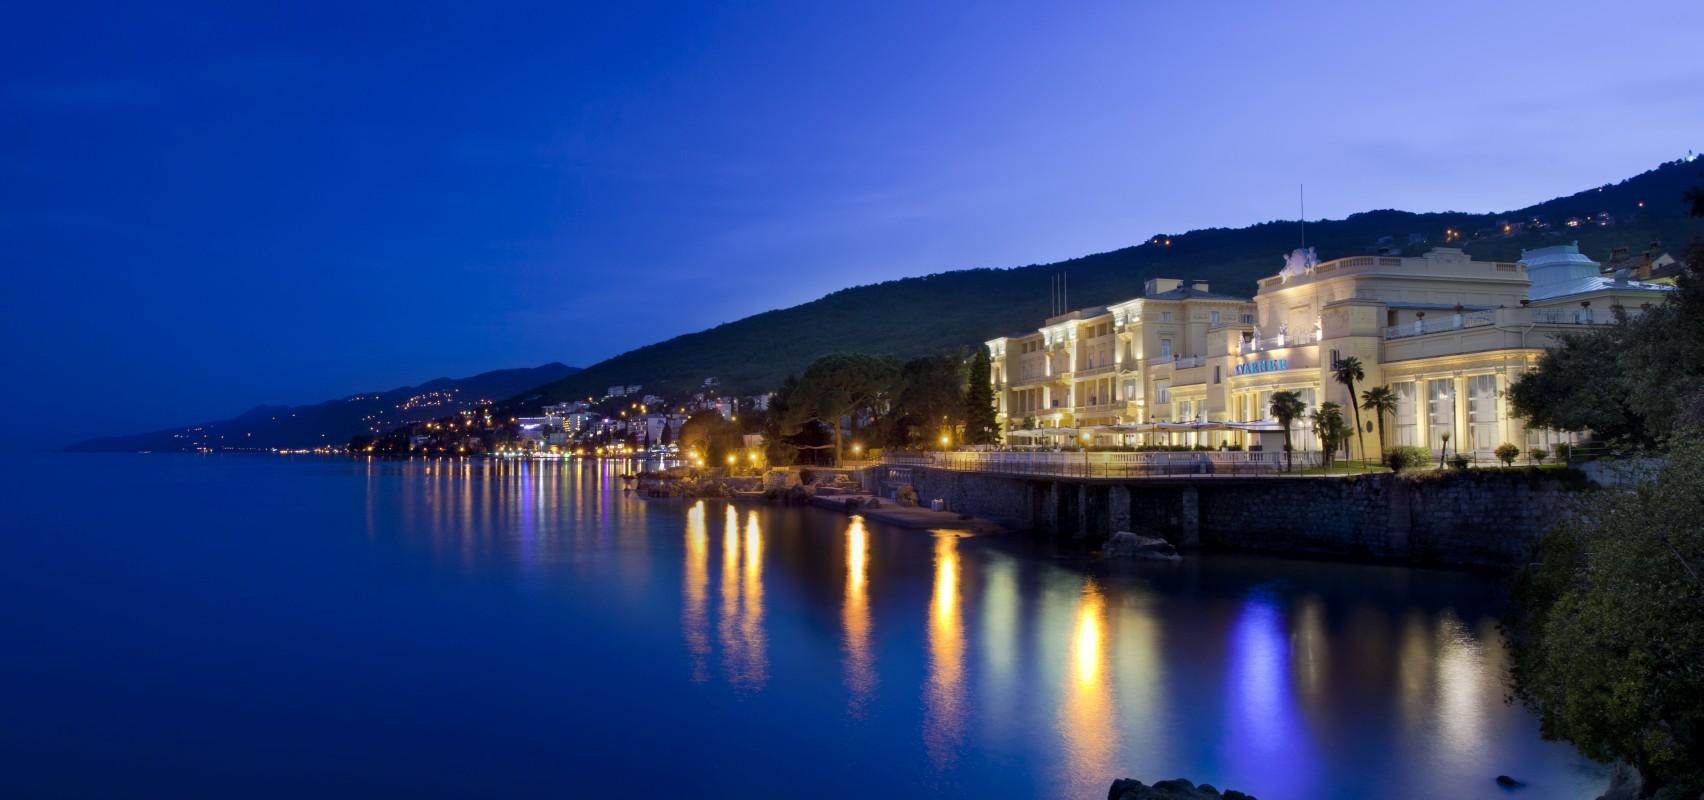 Horvat_hotel-kvarner-opatija-001-fullscreen-big